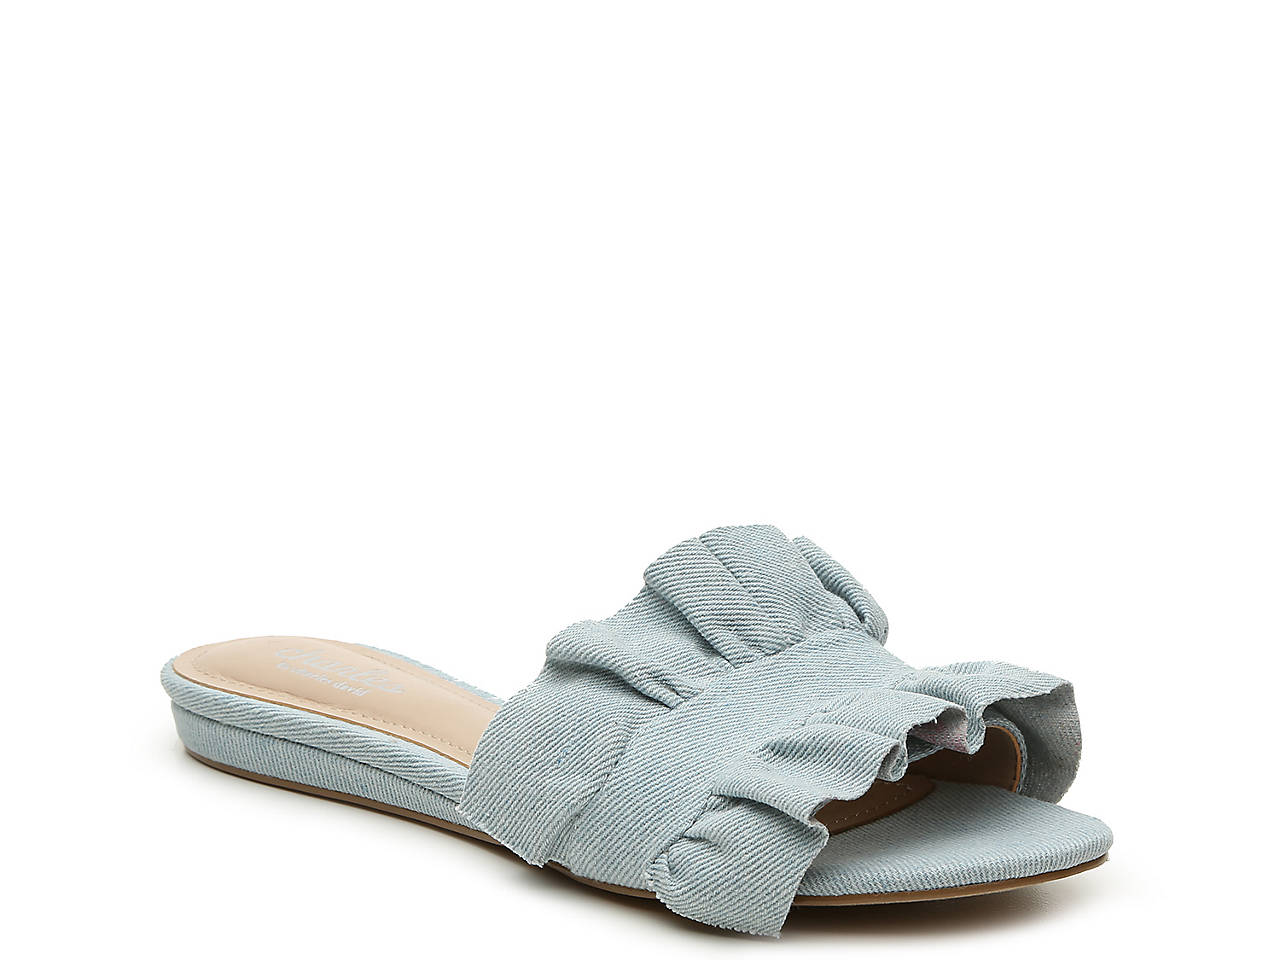 e8d95d50f Charles by Charles David Maye Sandal Women s Shoes